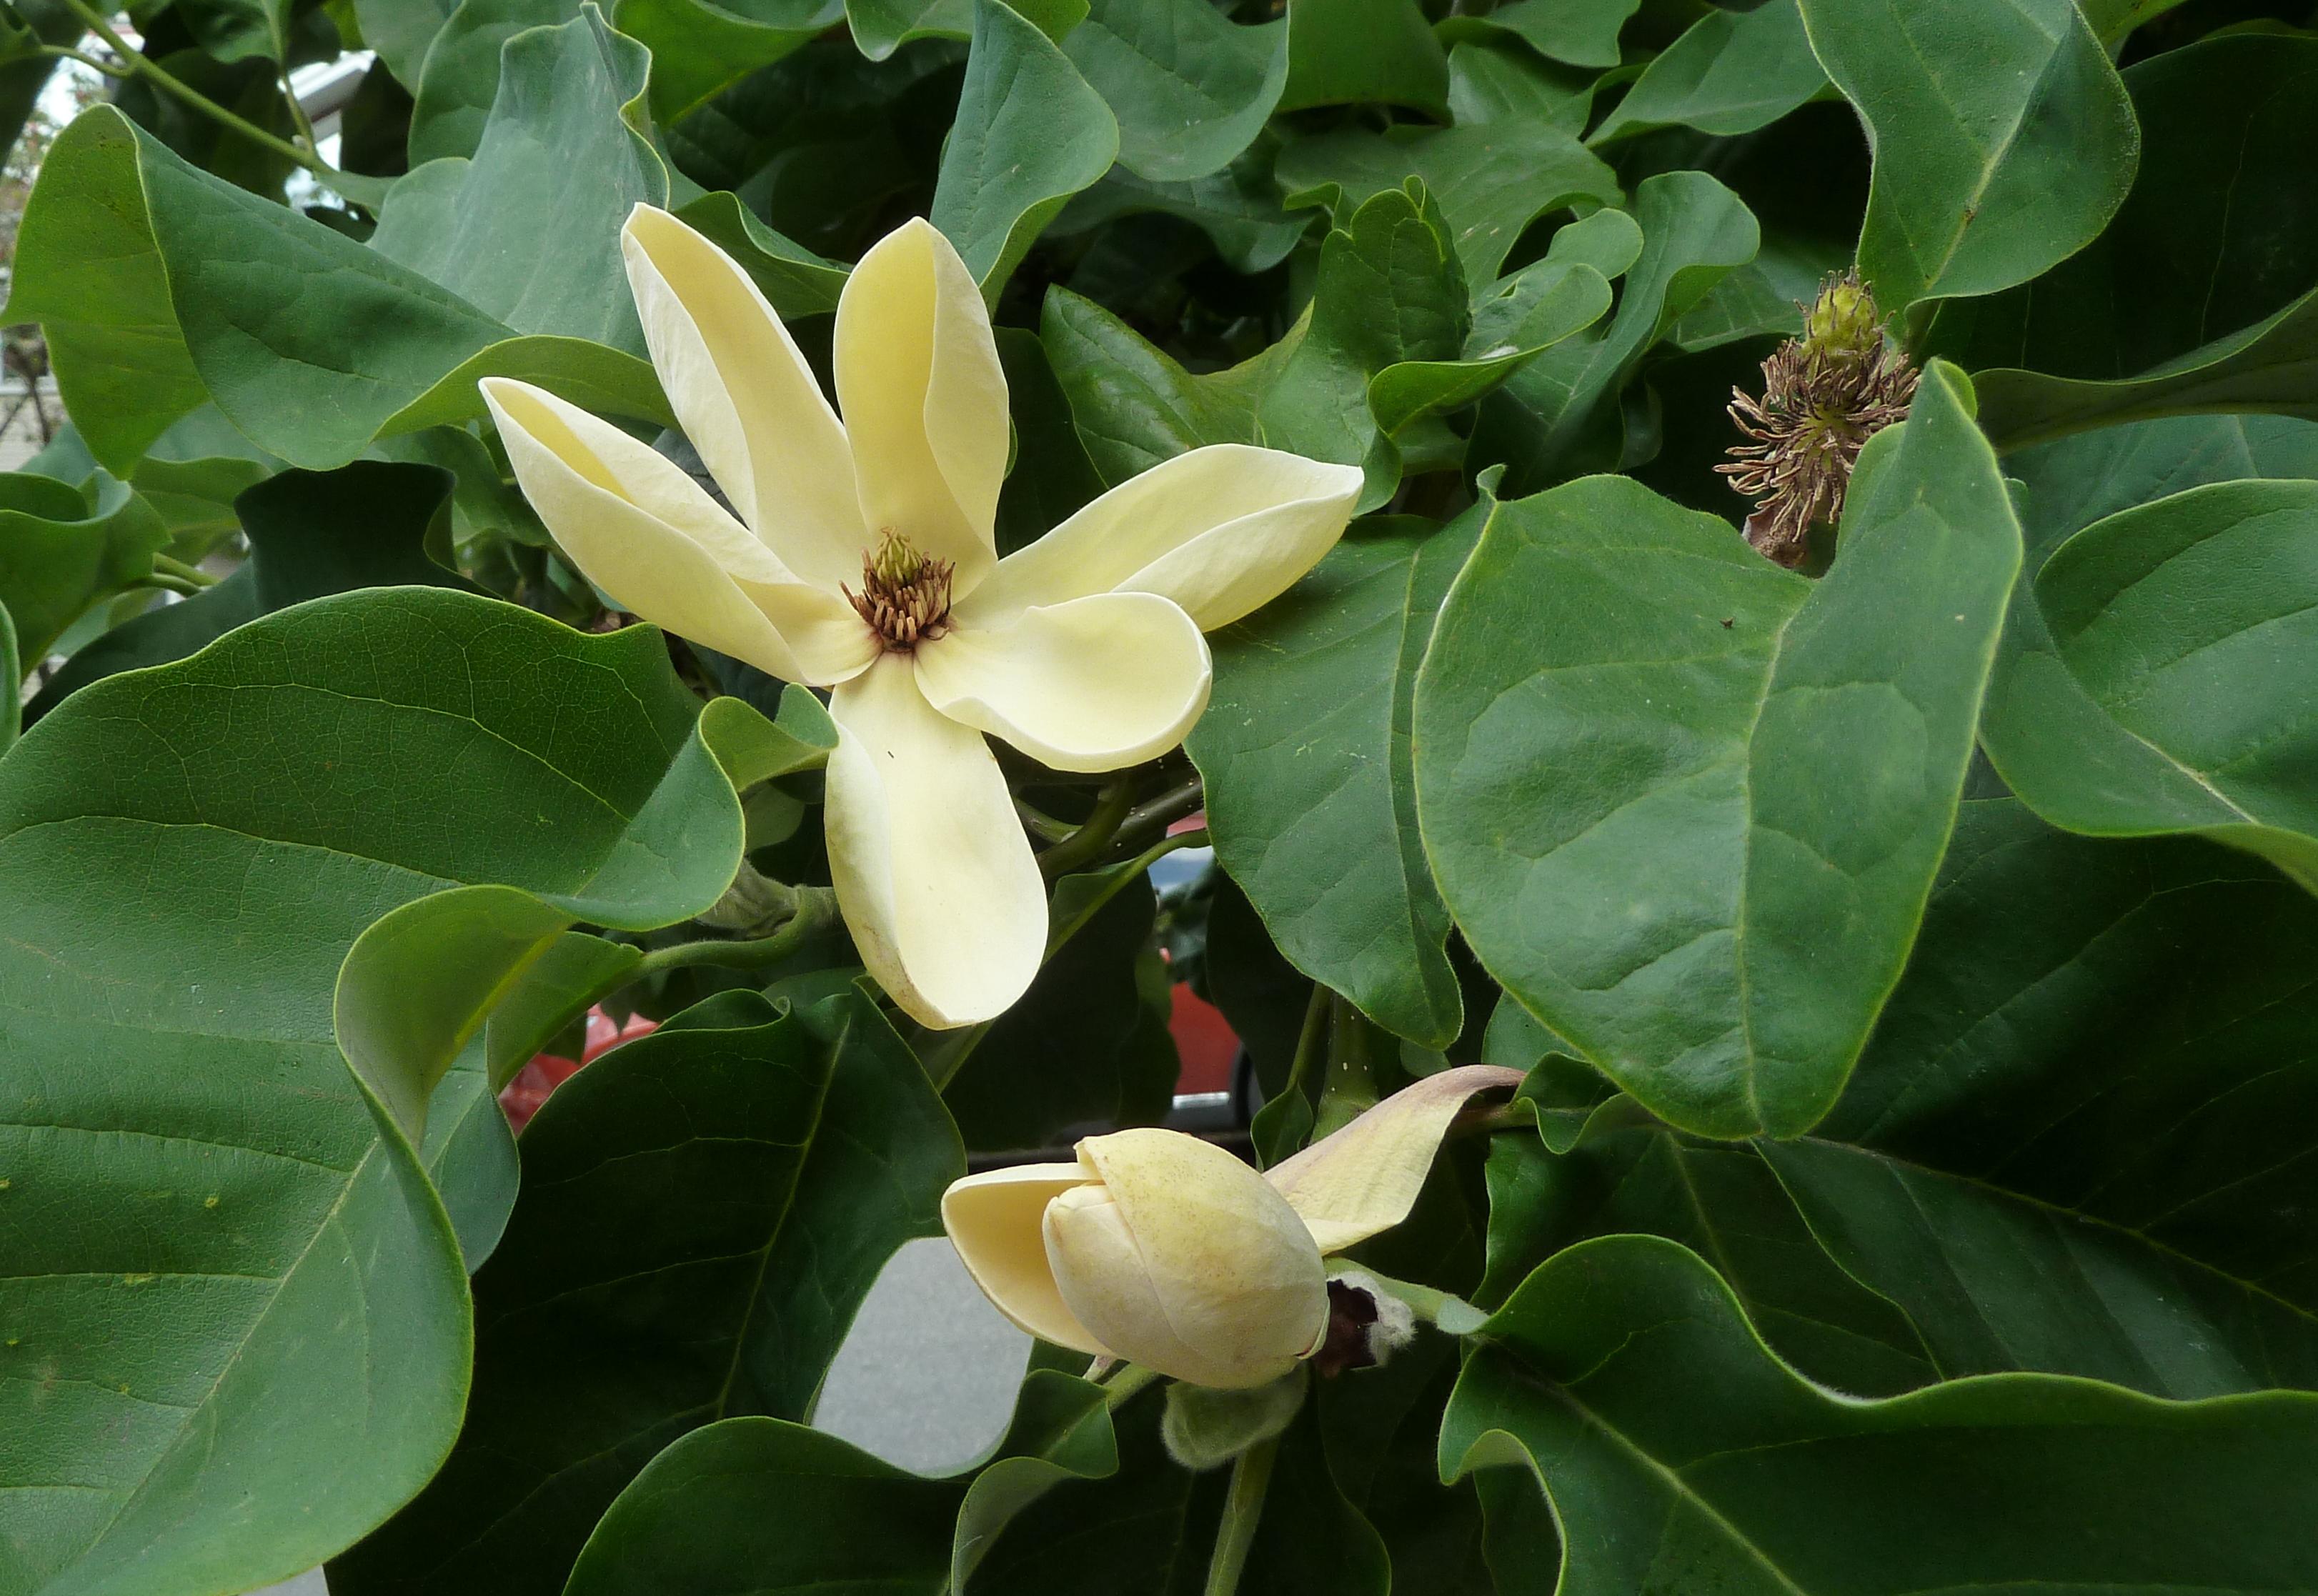 Filemagnolia yellow birdg wikimedia commons filemagnolia yellow birdg mightylinksfo Gallery